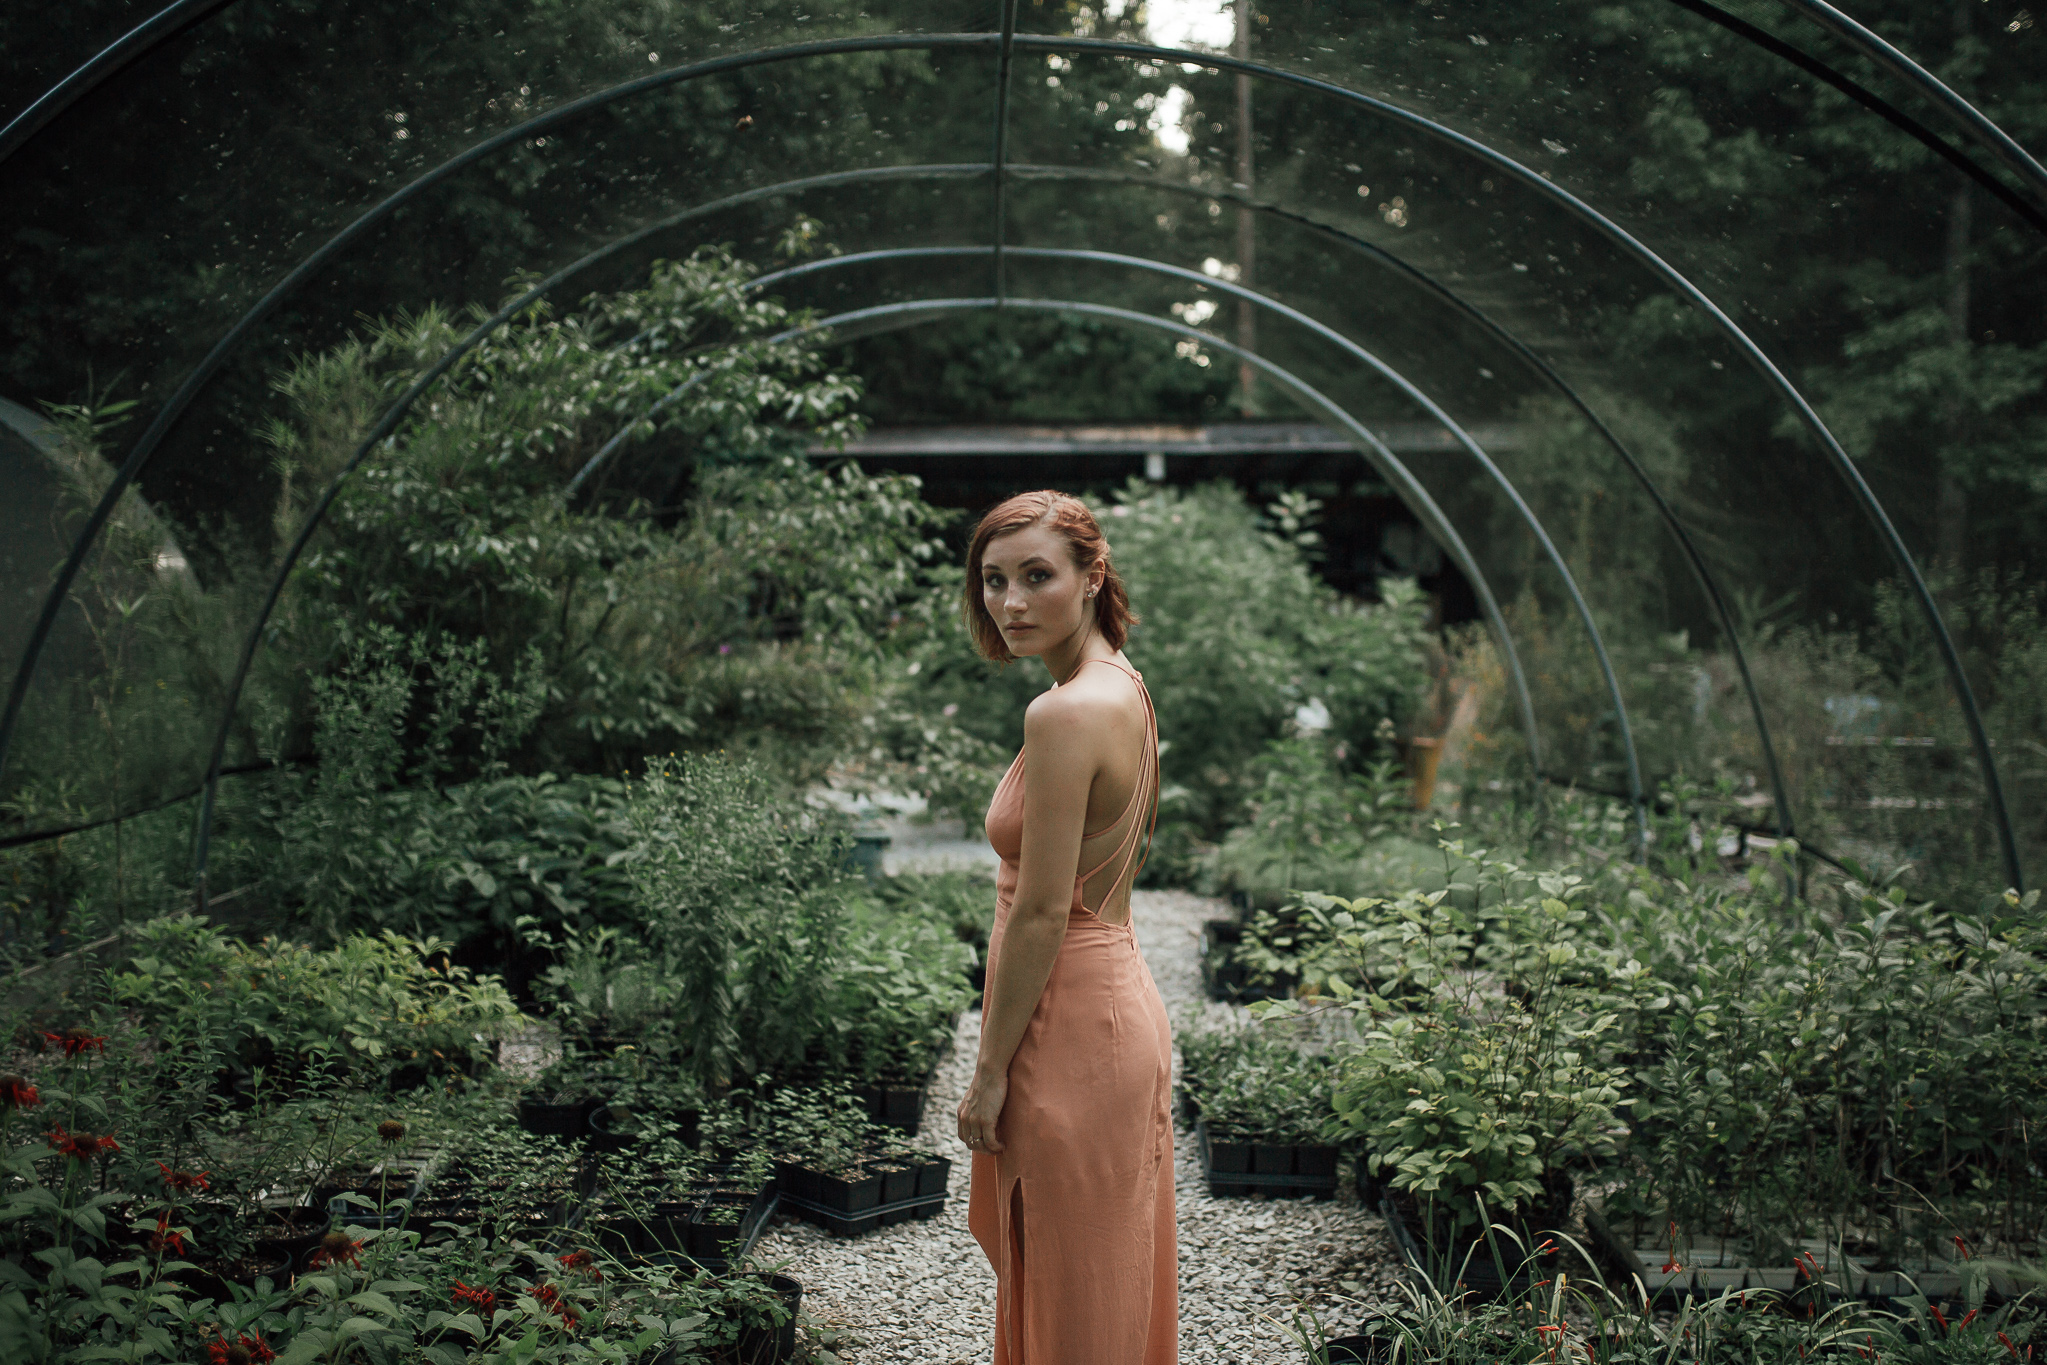 cassie-cook-photography-memphis-portrait-photographer-strawberry-plains-holly-springs